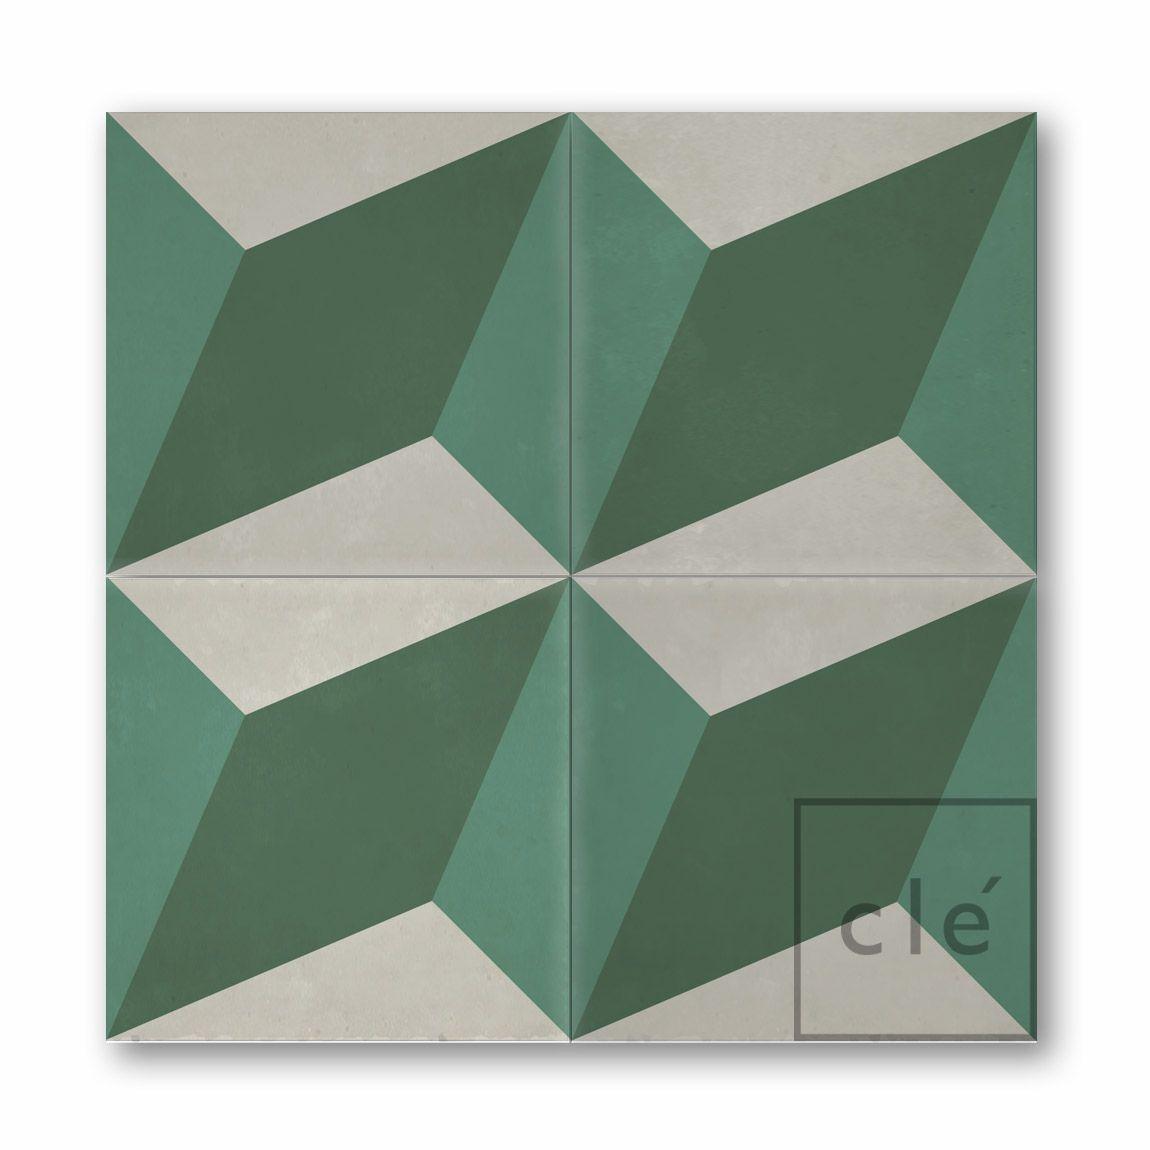 Bathroom Flooring: Cle tile - cement tile - diamond twist c w1